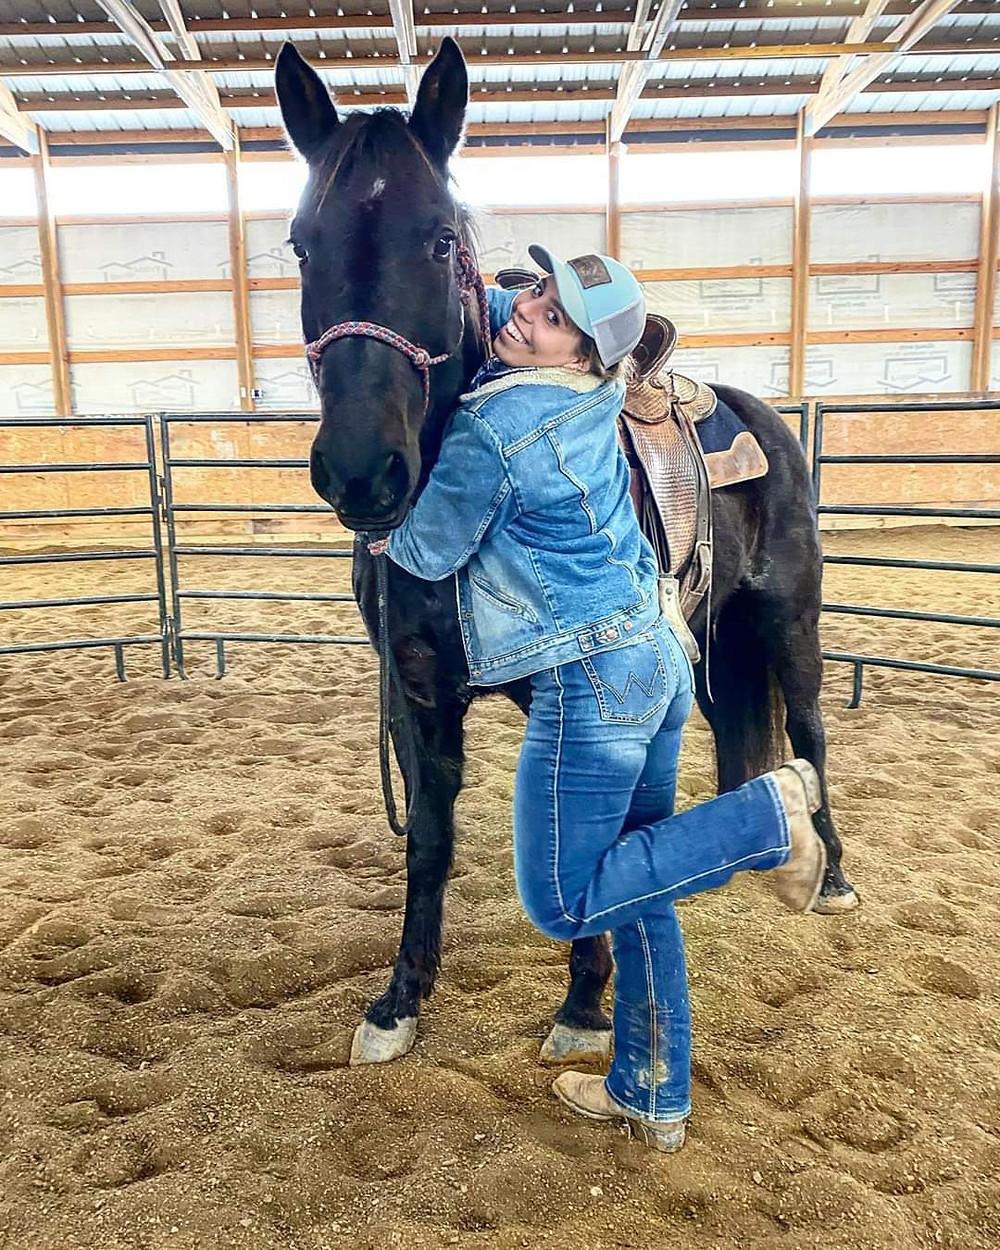 rapport, nlp, horsemanship, cowgil, horse riding, horse girl, communication